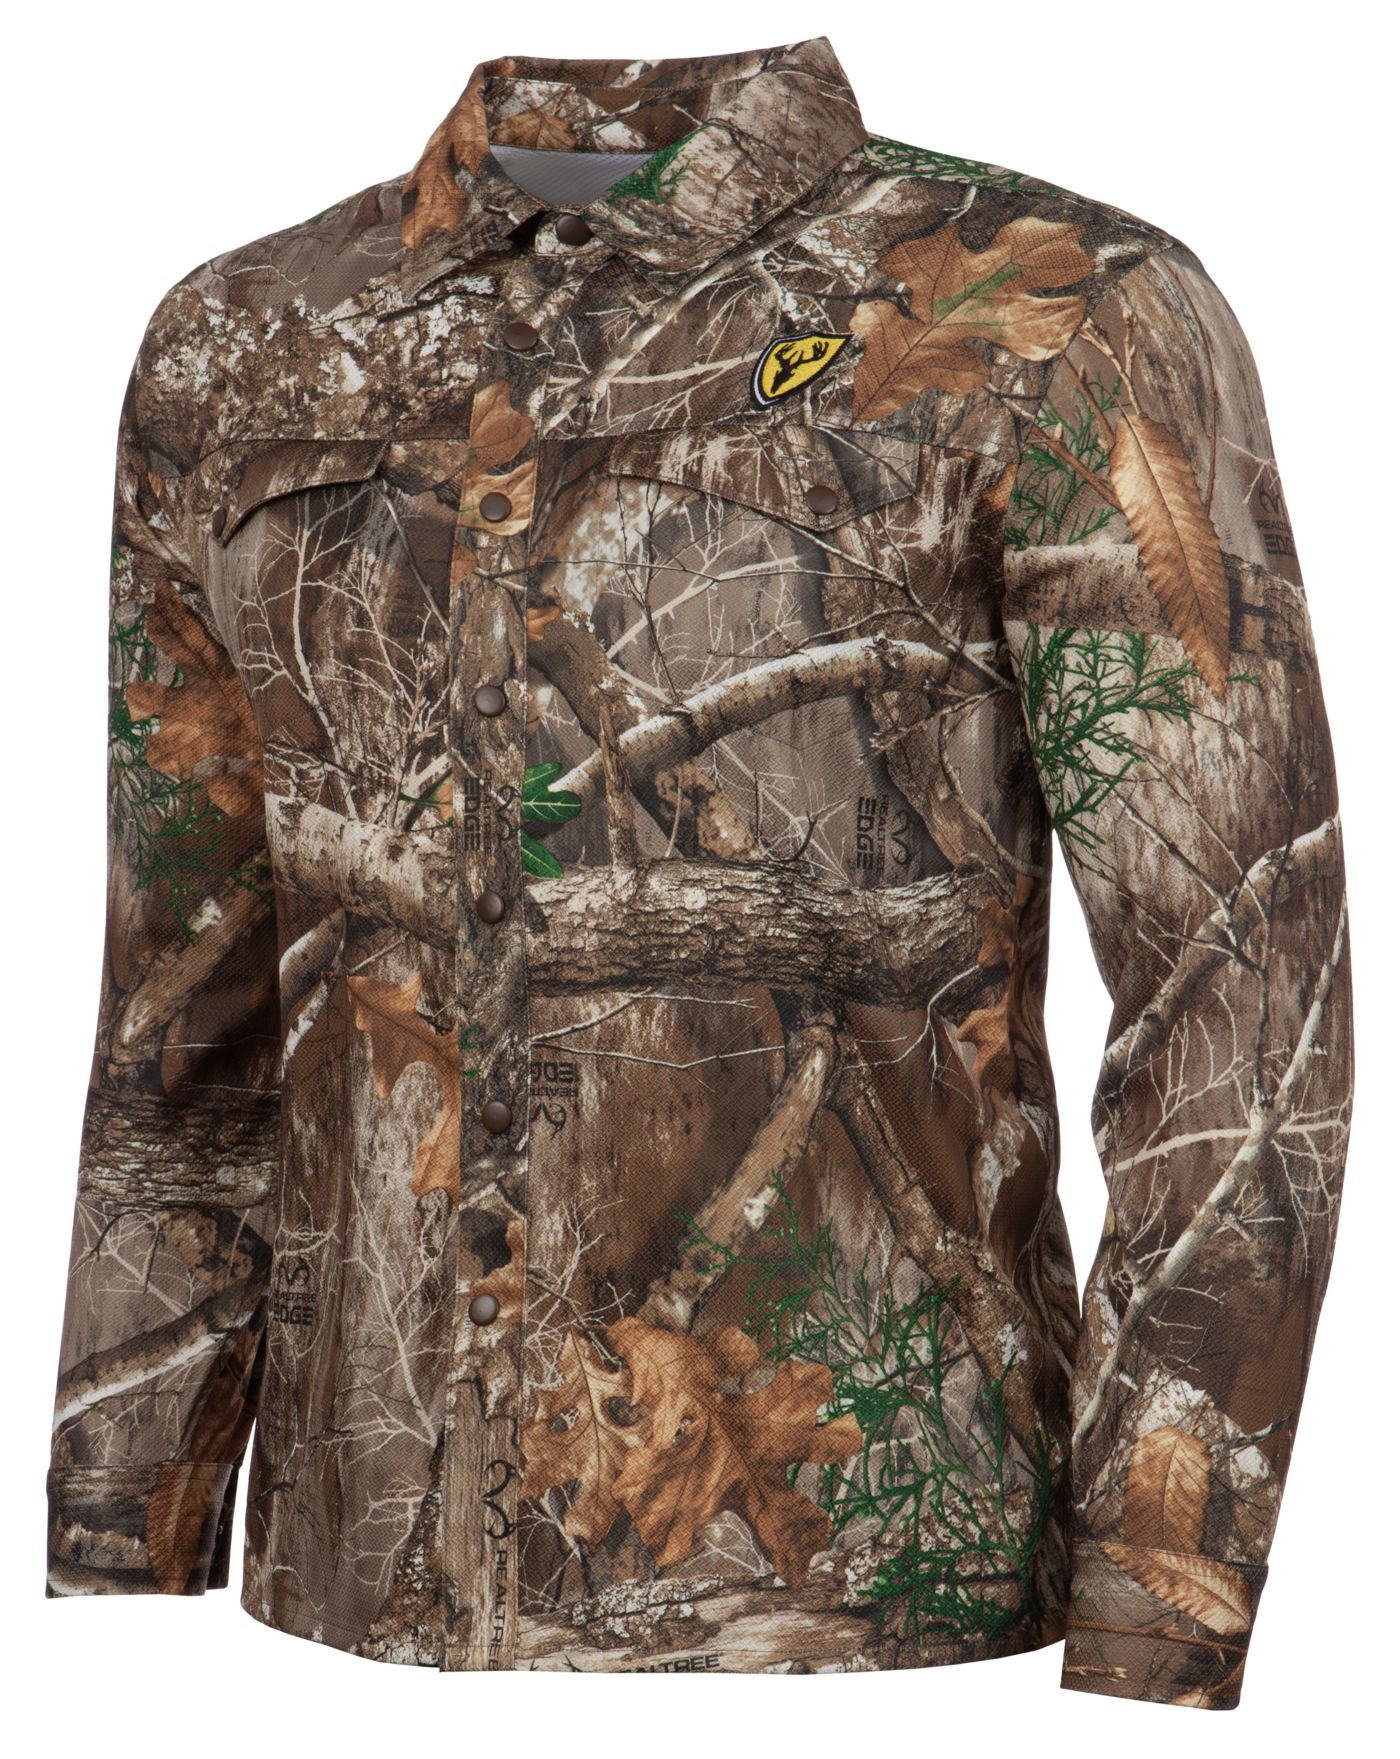 Blocker Outdoors Men's Shield Series Angatec Snap Shirt